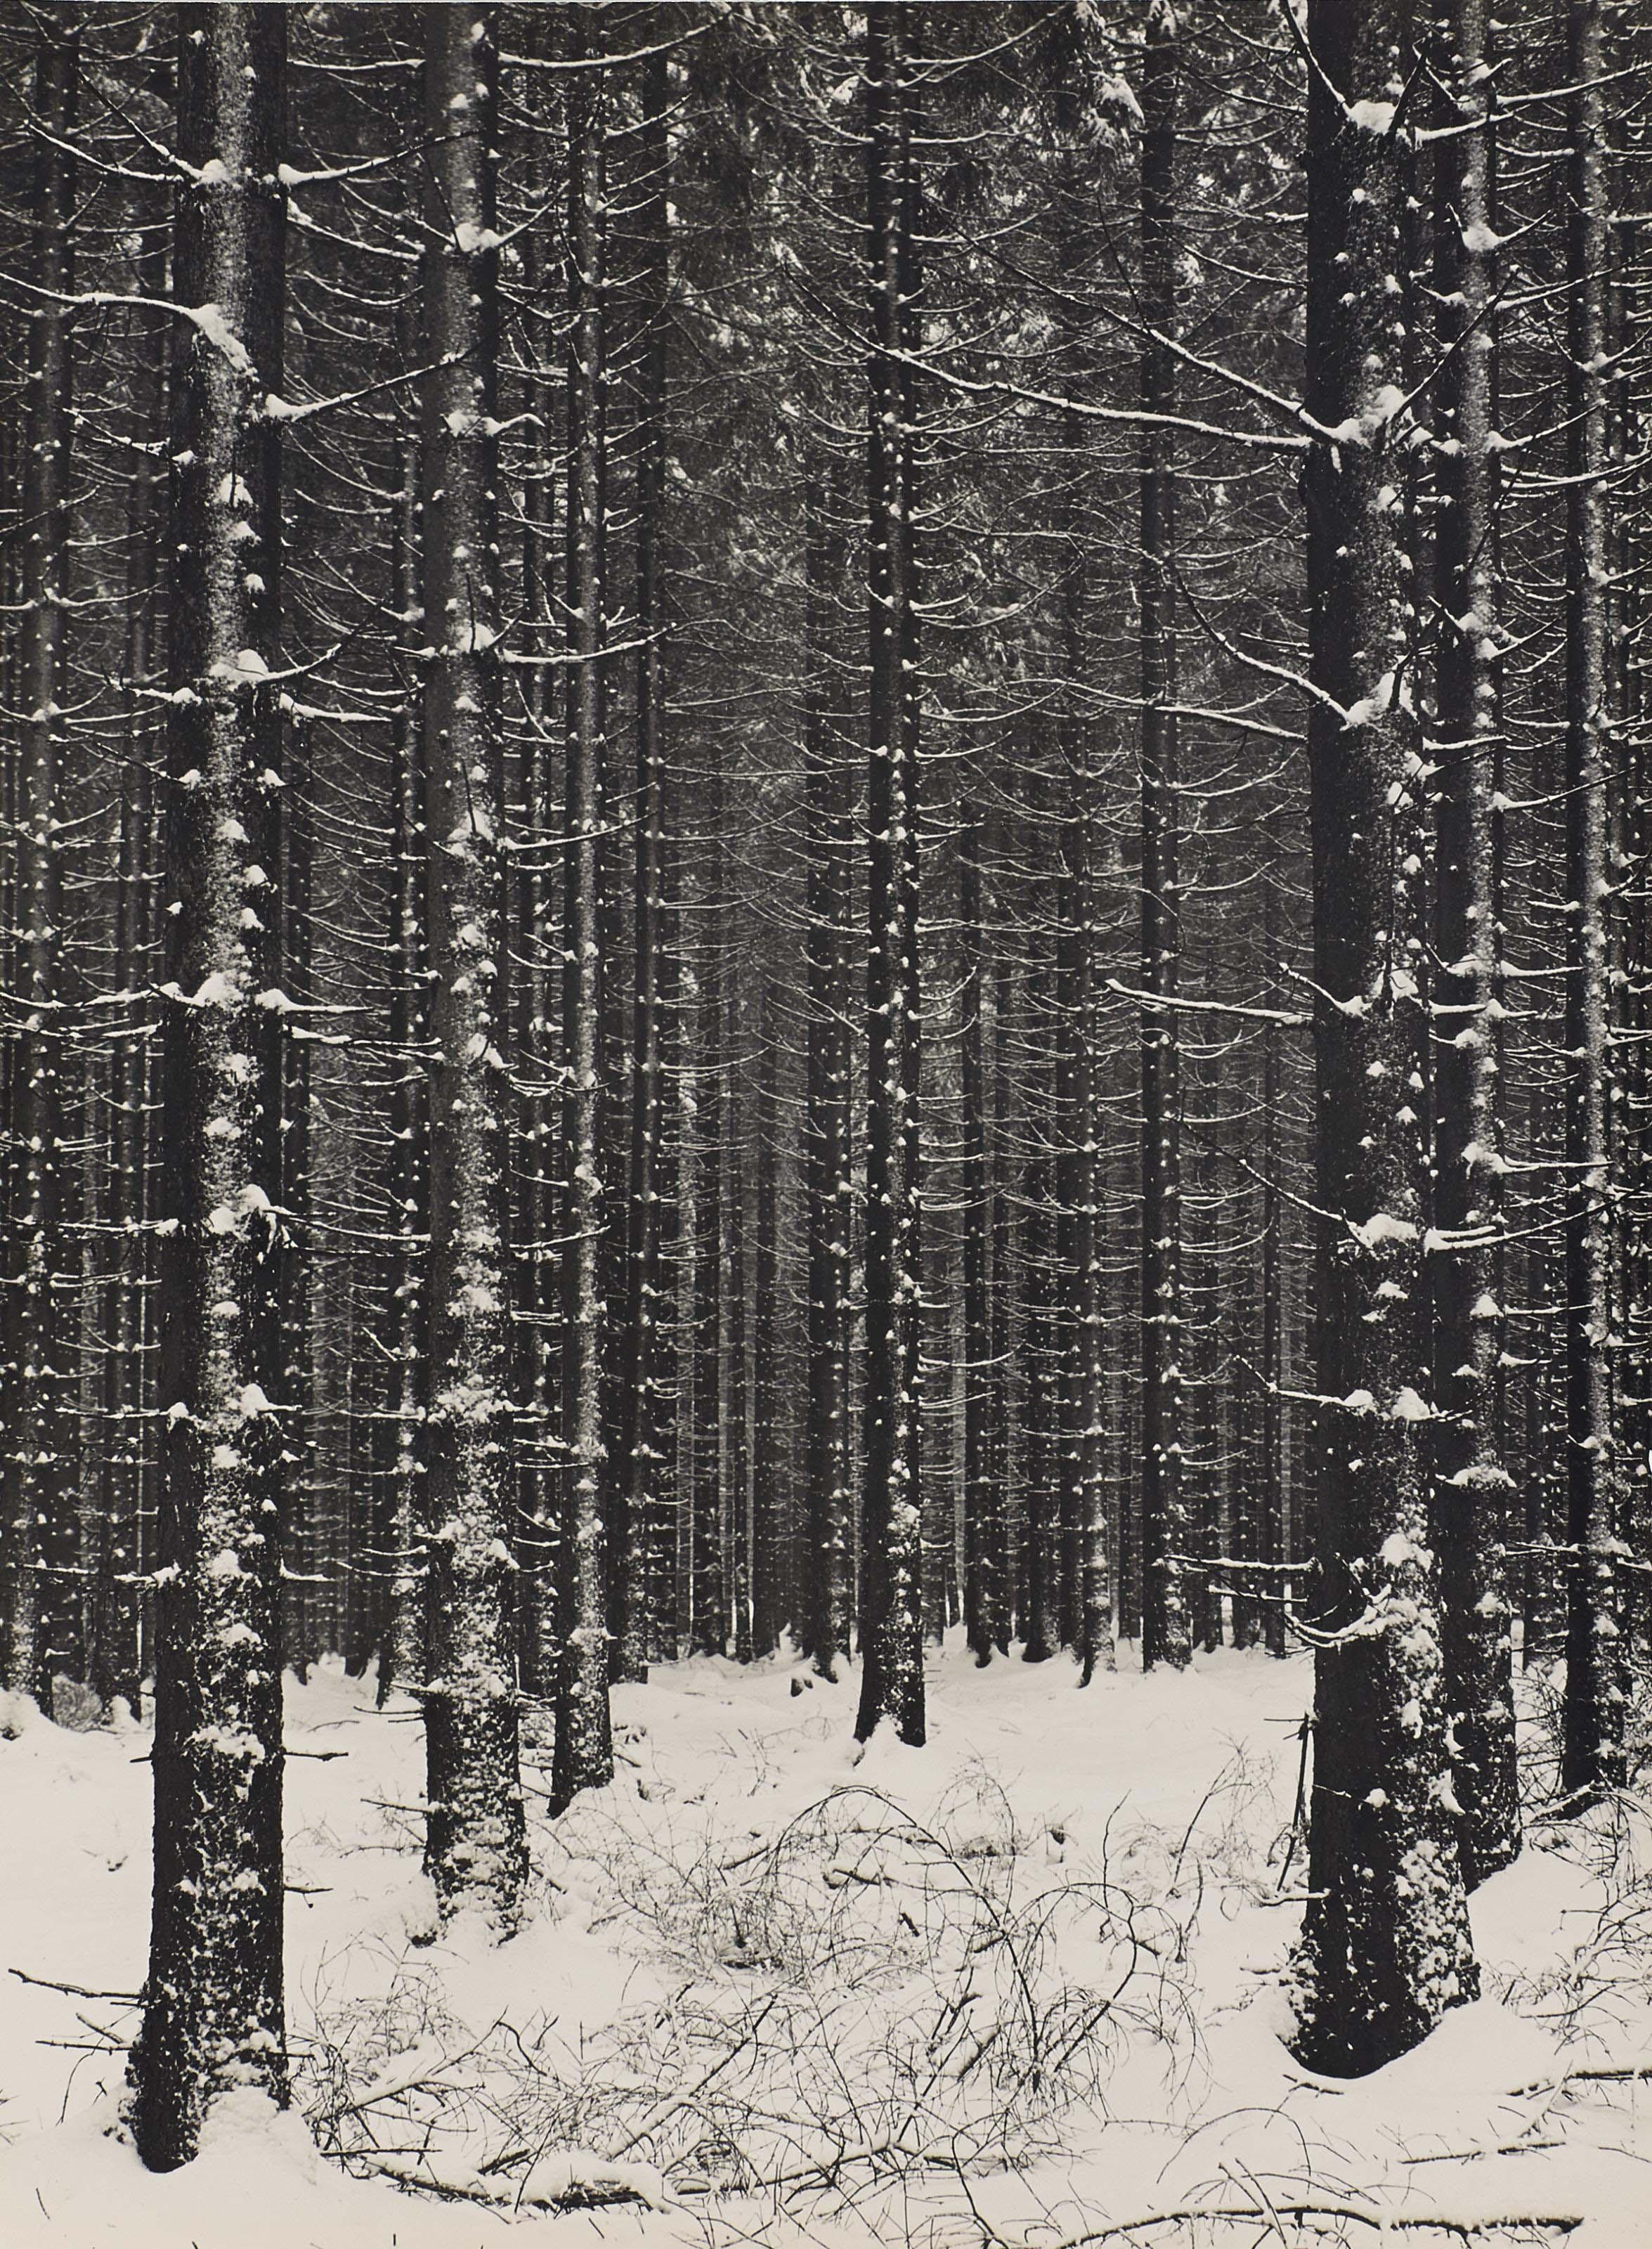 Gebirgsforst (forêt de montagne), 1926